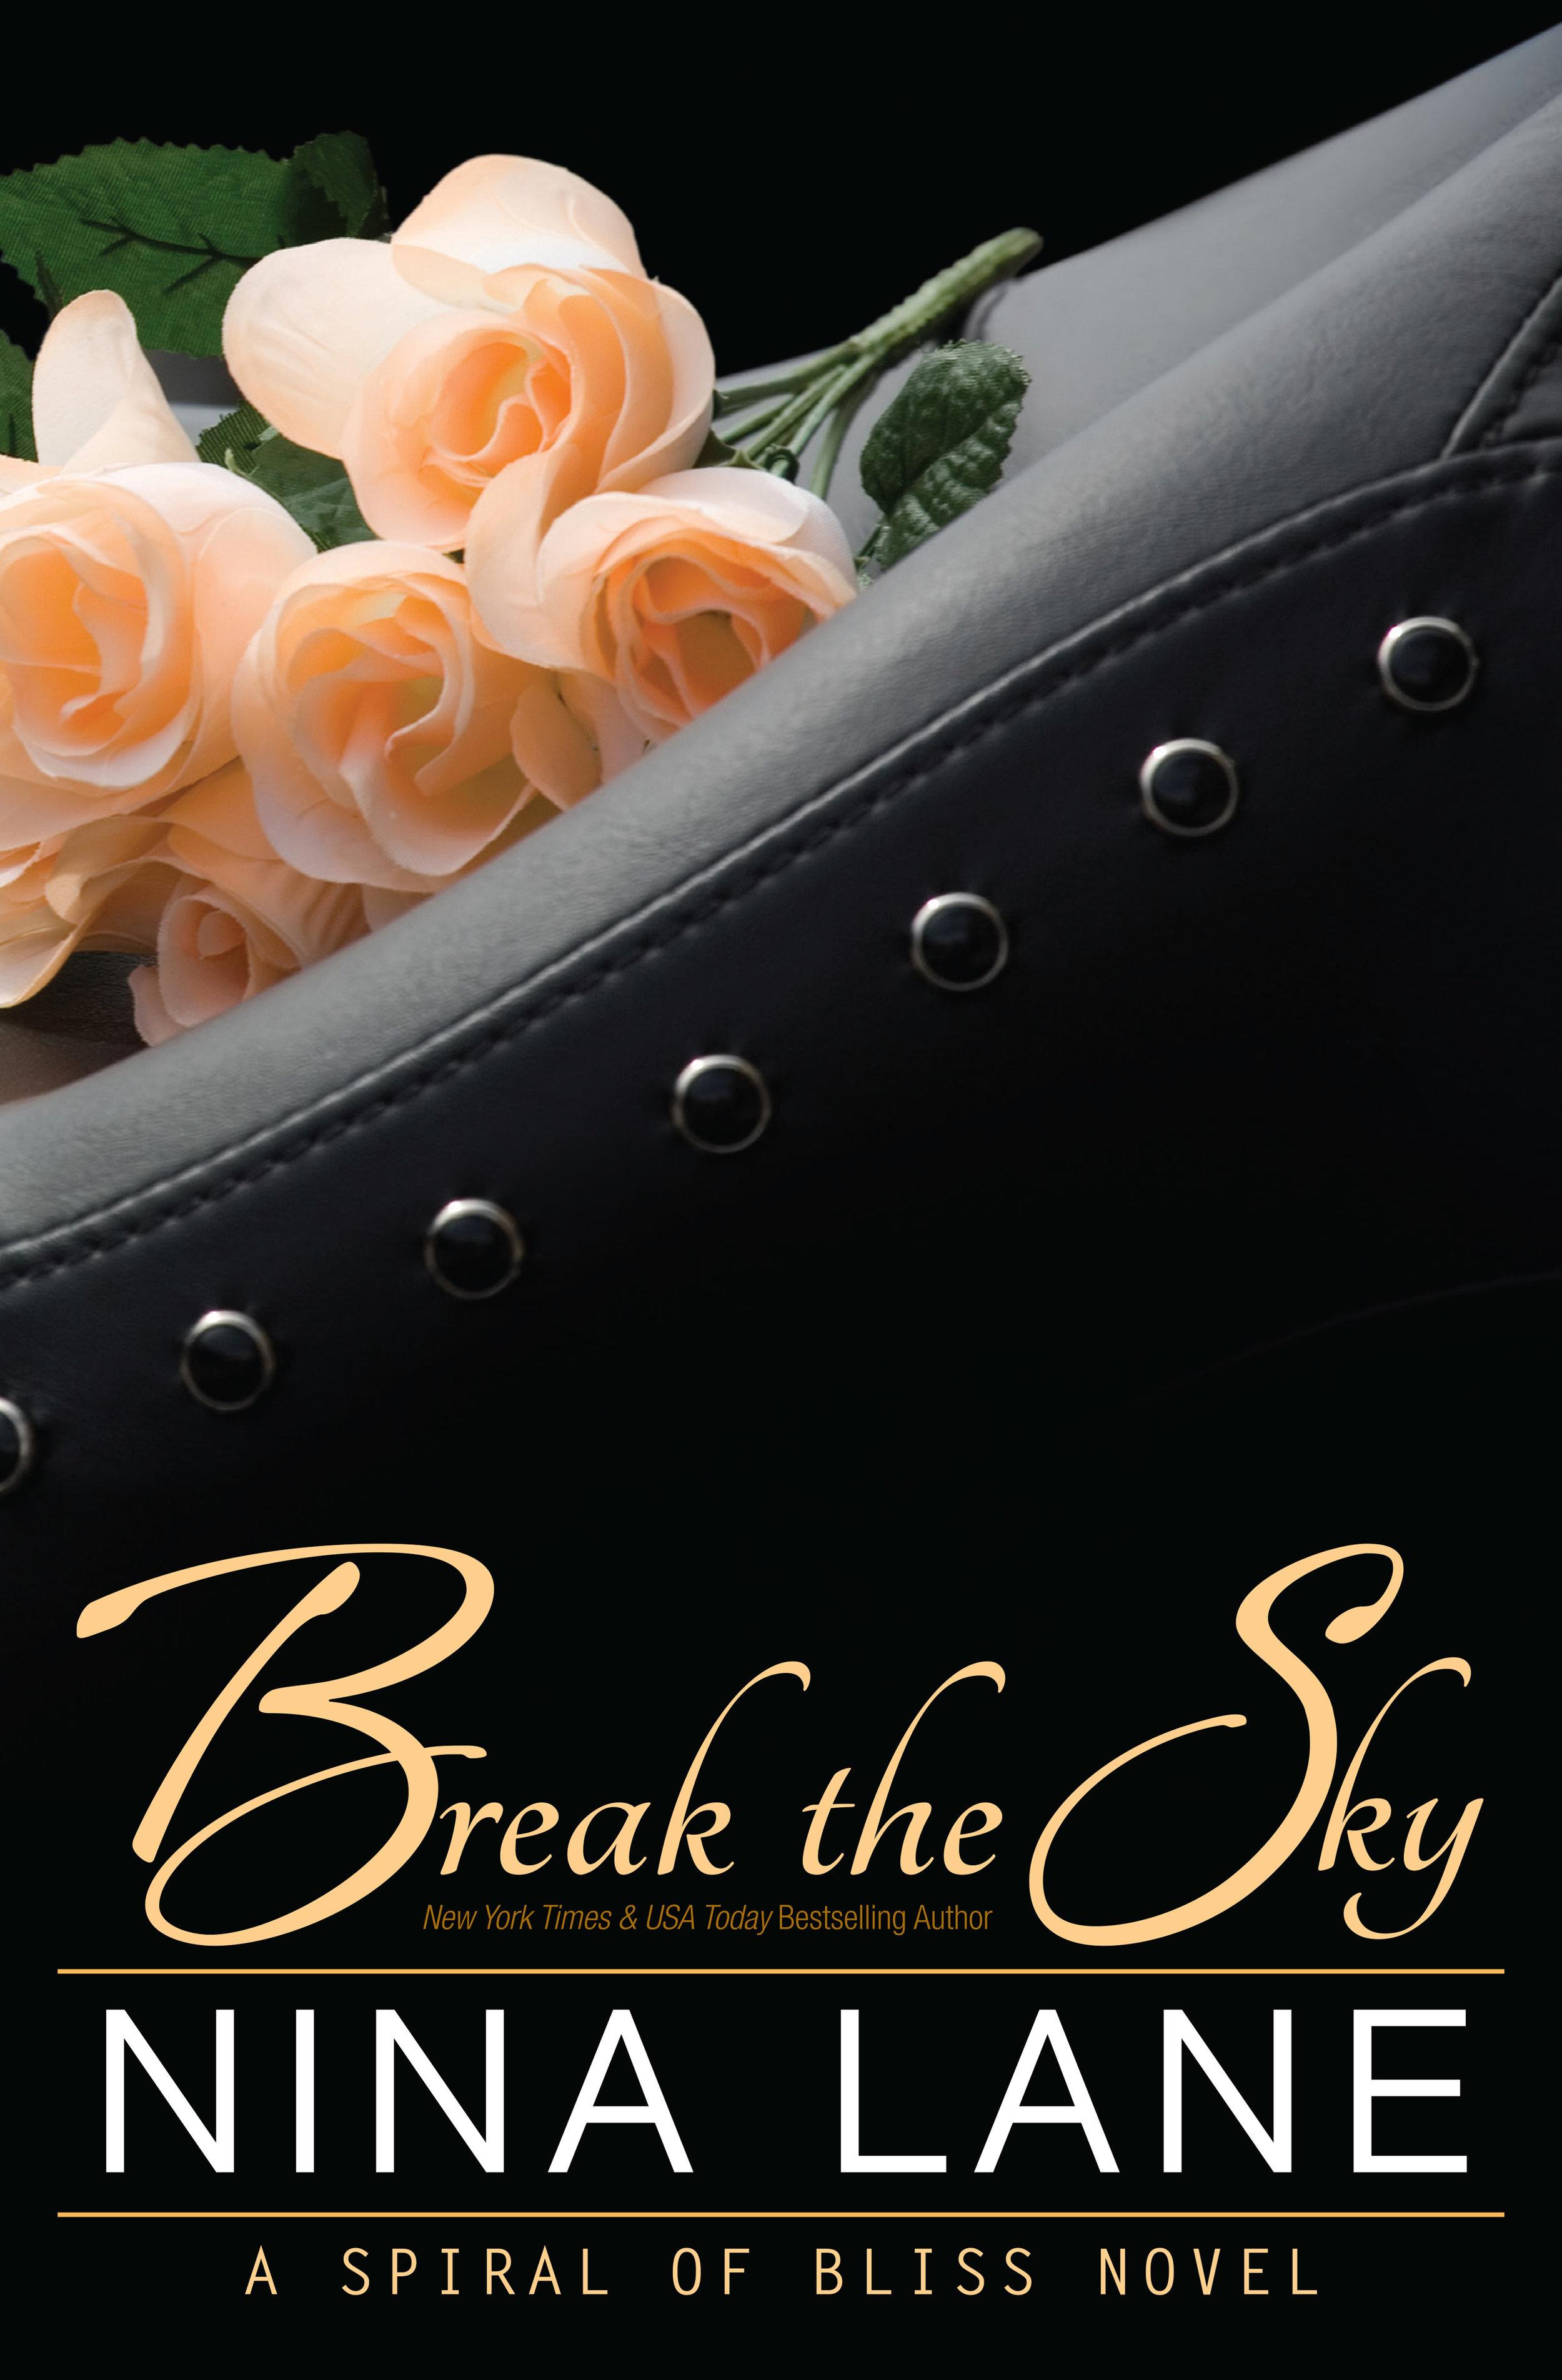 SOB_5_BREAKTHESKY_FrontCovers_Object_10917_Kindle.jpg